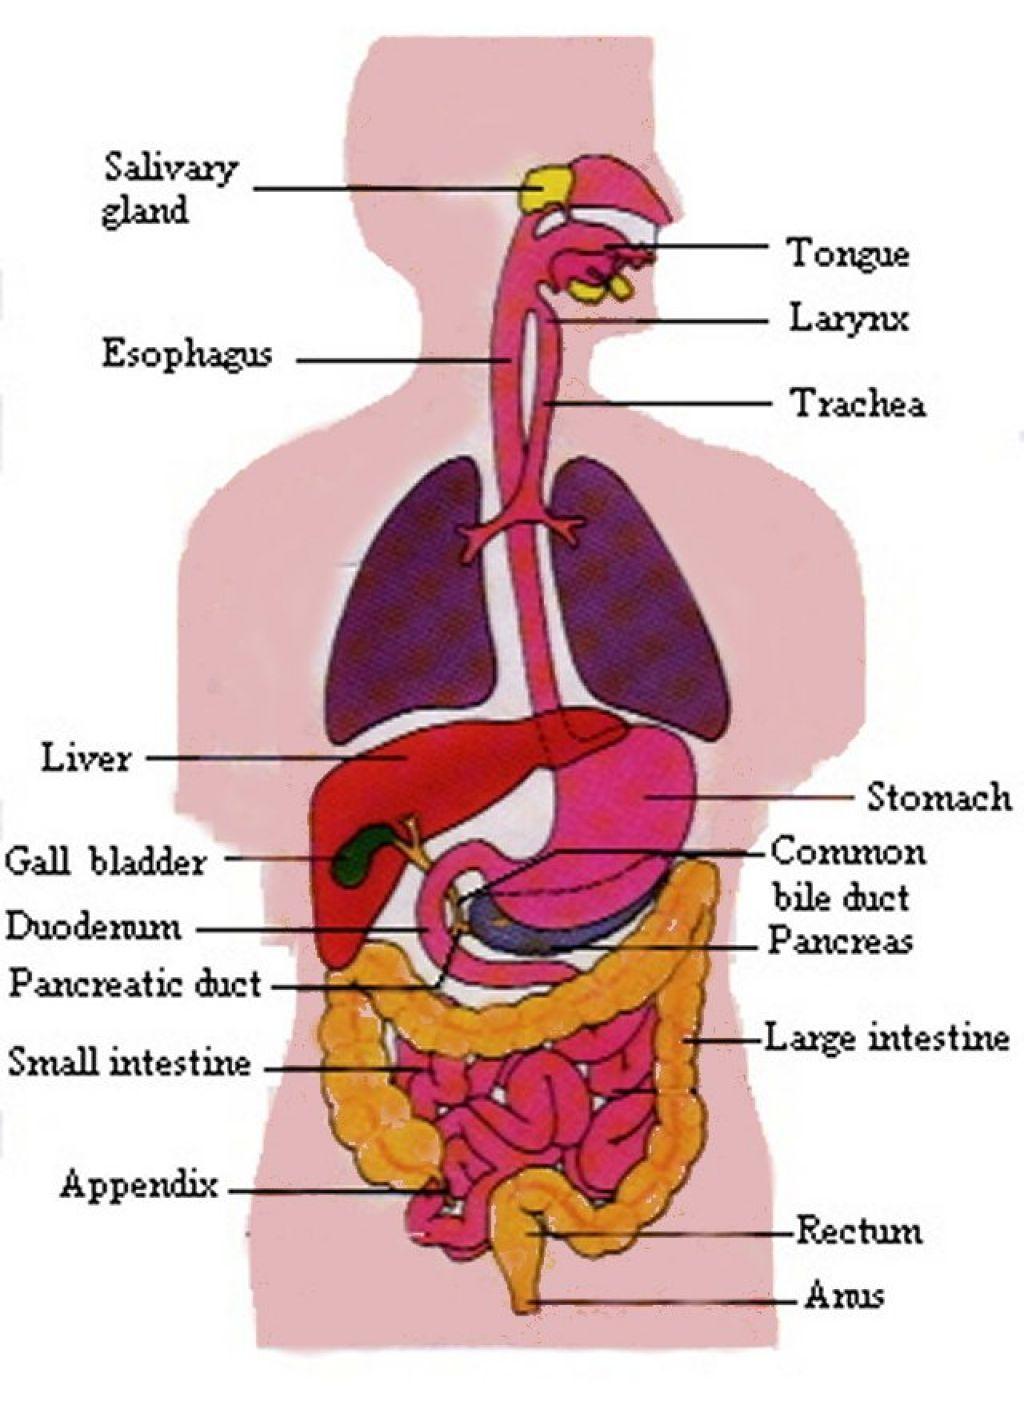 simple human anatomy diagram simple human anatomy diagram simple human digestive system sketch simple human [ 1024 x 1425 Pixel ]